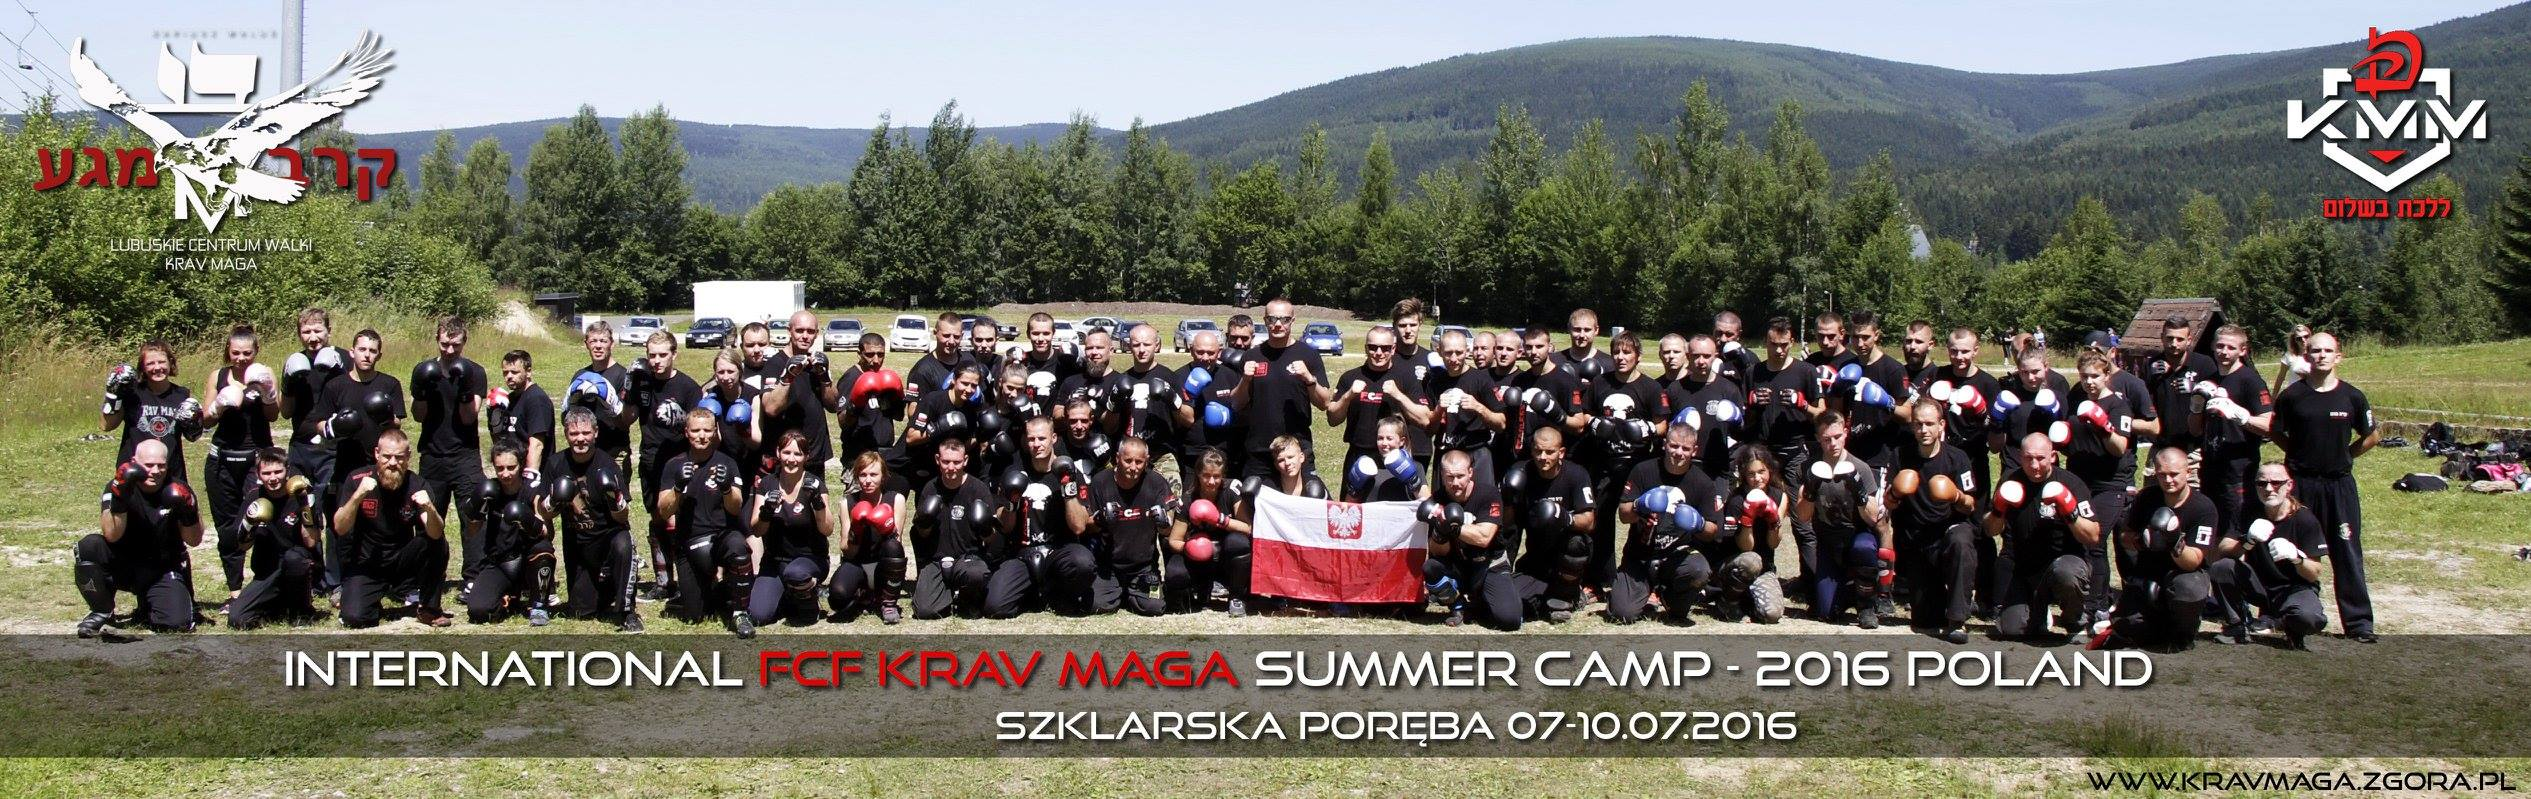 20160710_international_fcf_kravmaga_summer_camp_poland_full